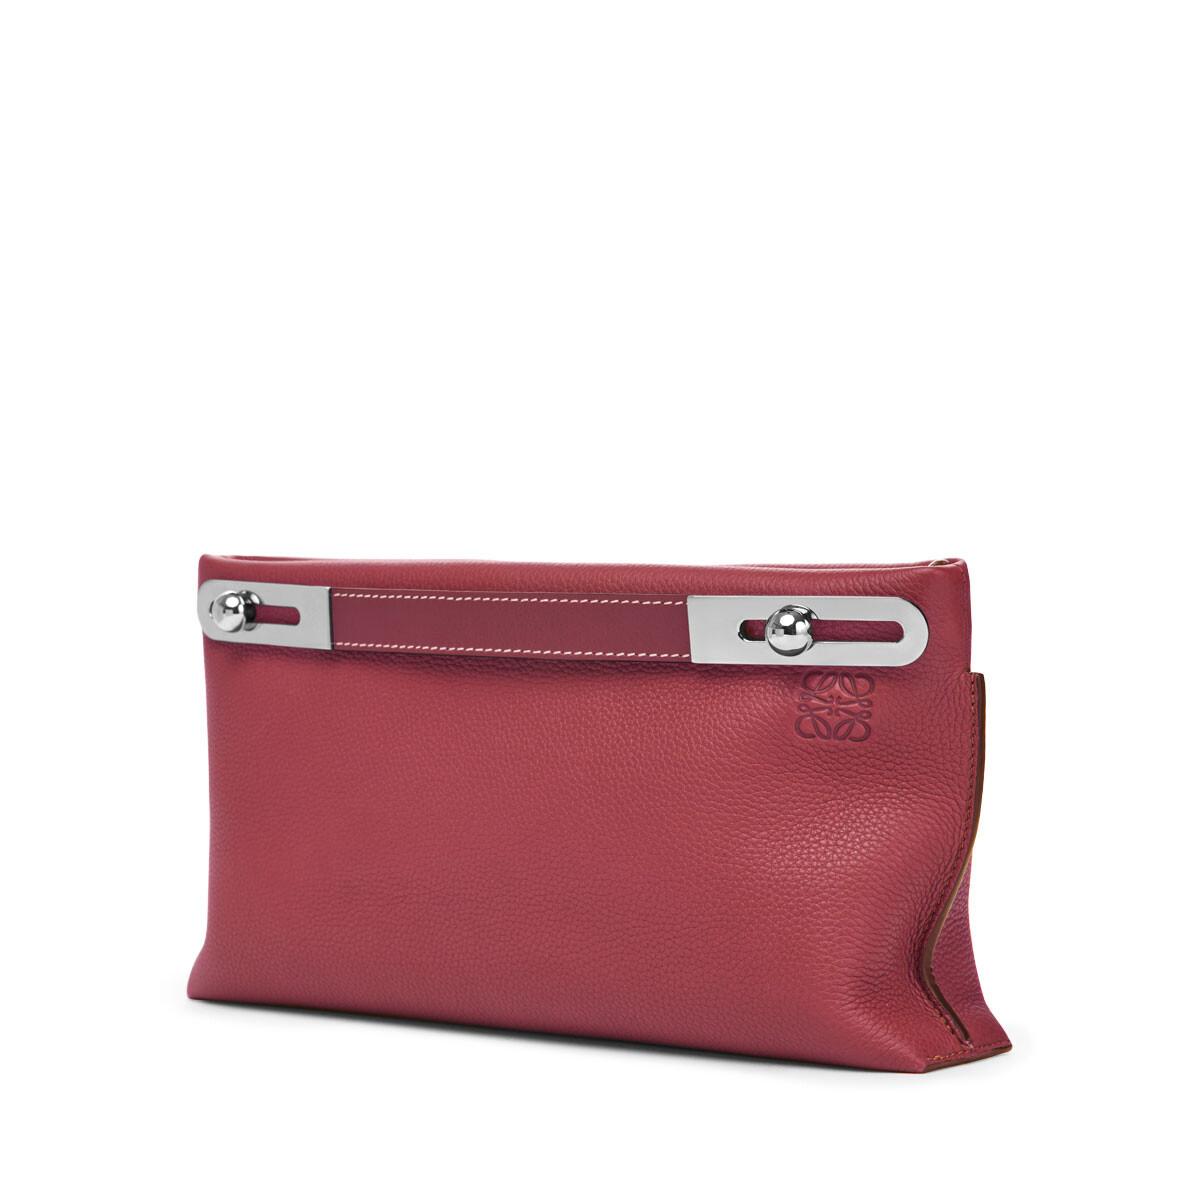 LOEWE Missy Small Bag Raspberry front